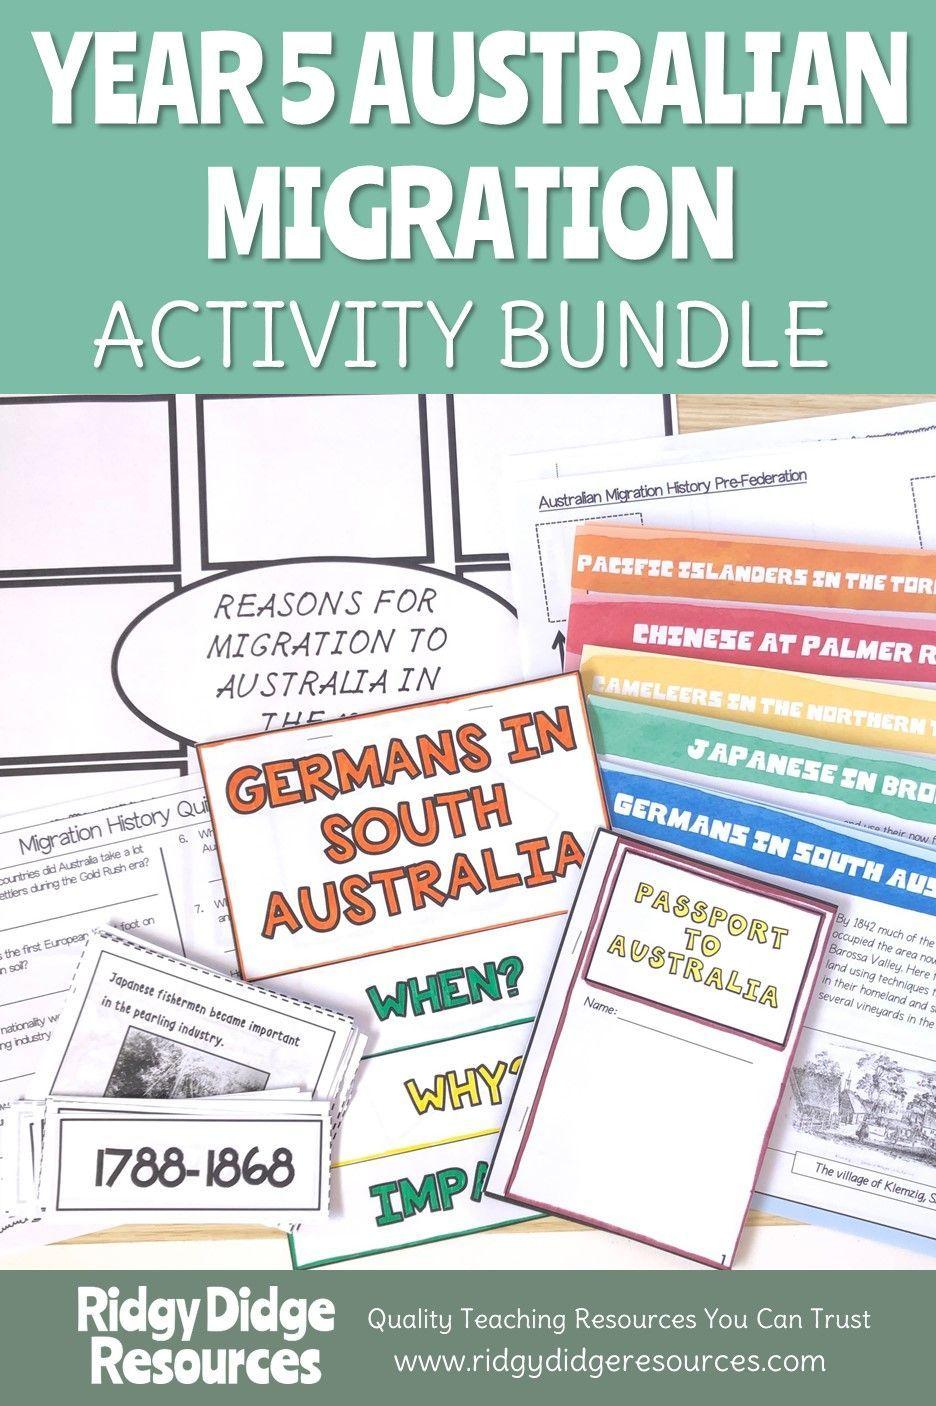 Migration to Australia Year 5 Activity Bundle Teaching